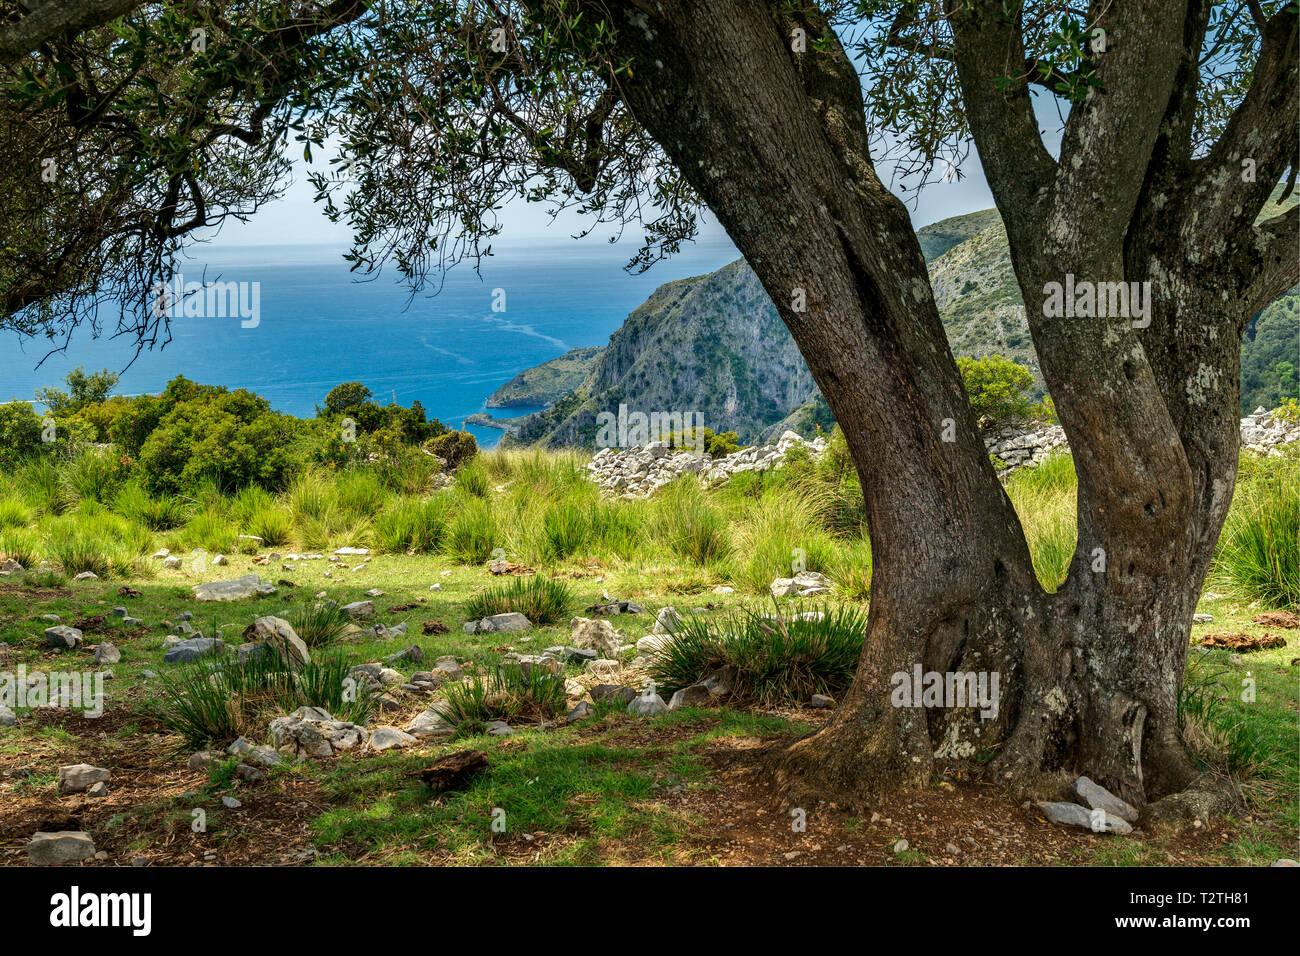 Italy, Campania, Cilento National Park,  Masseta and Infreschi  Coast, olive grove, Pisciottana olive tree - Stock Image